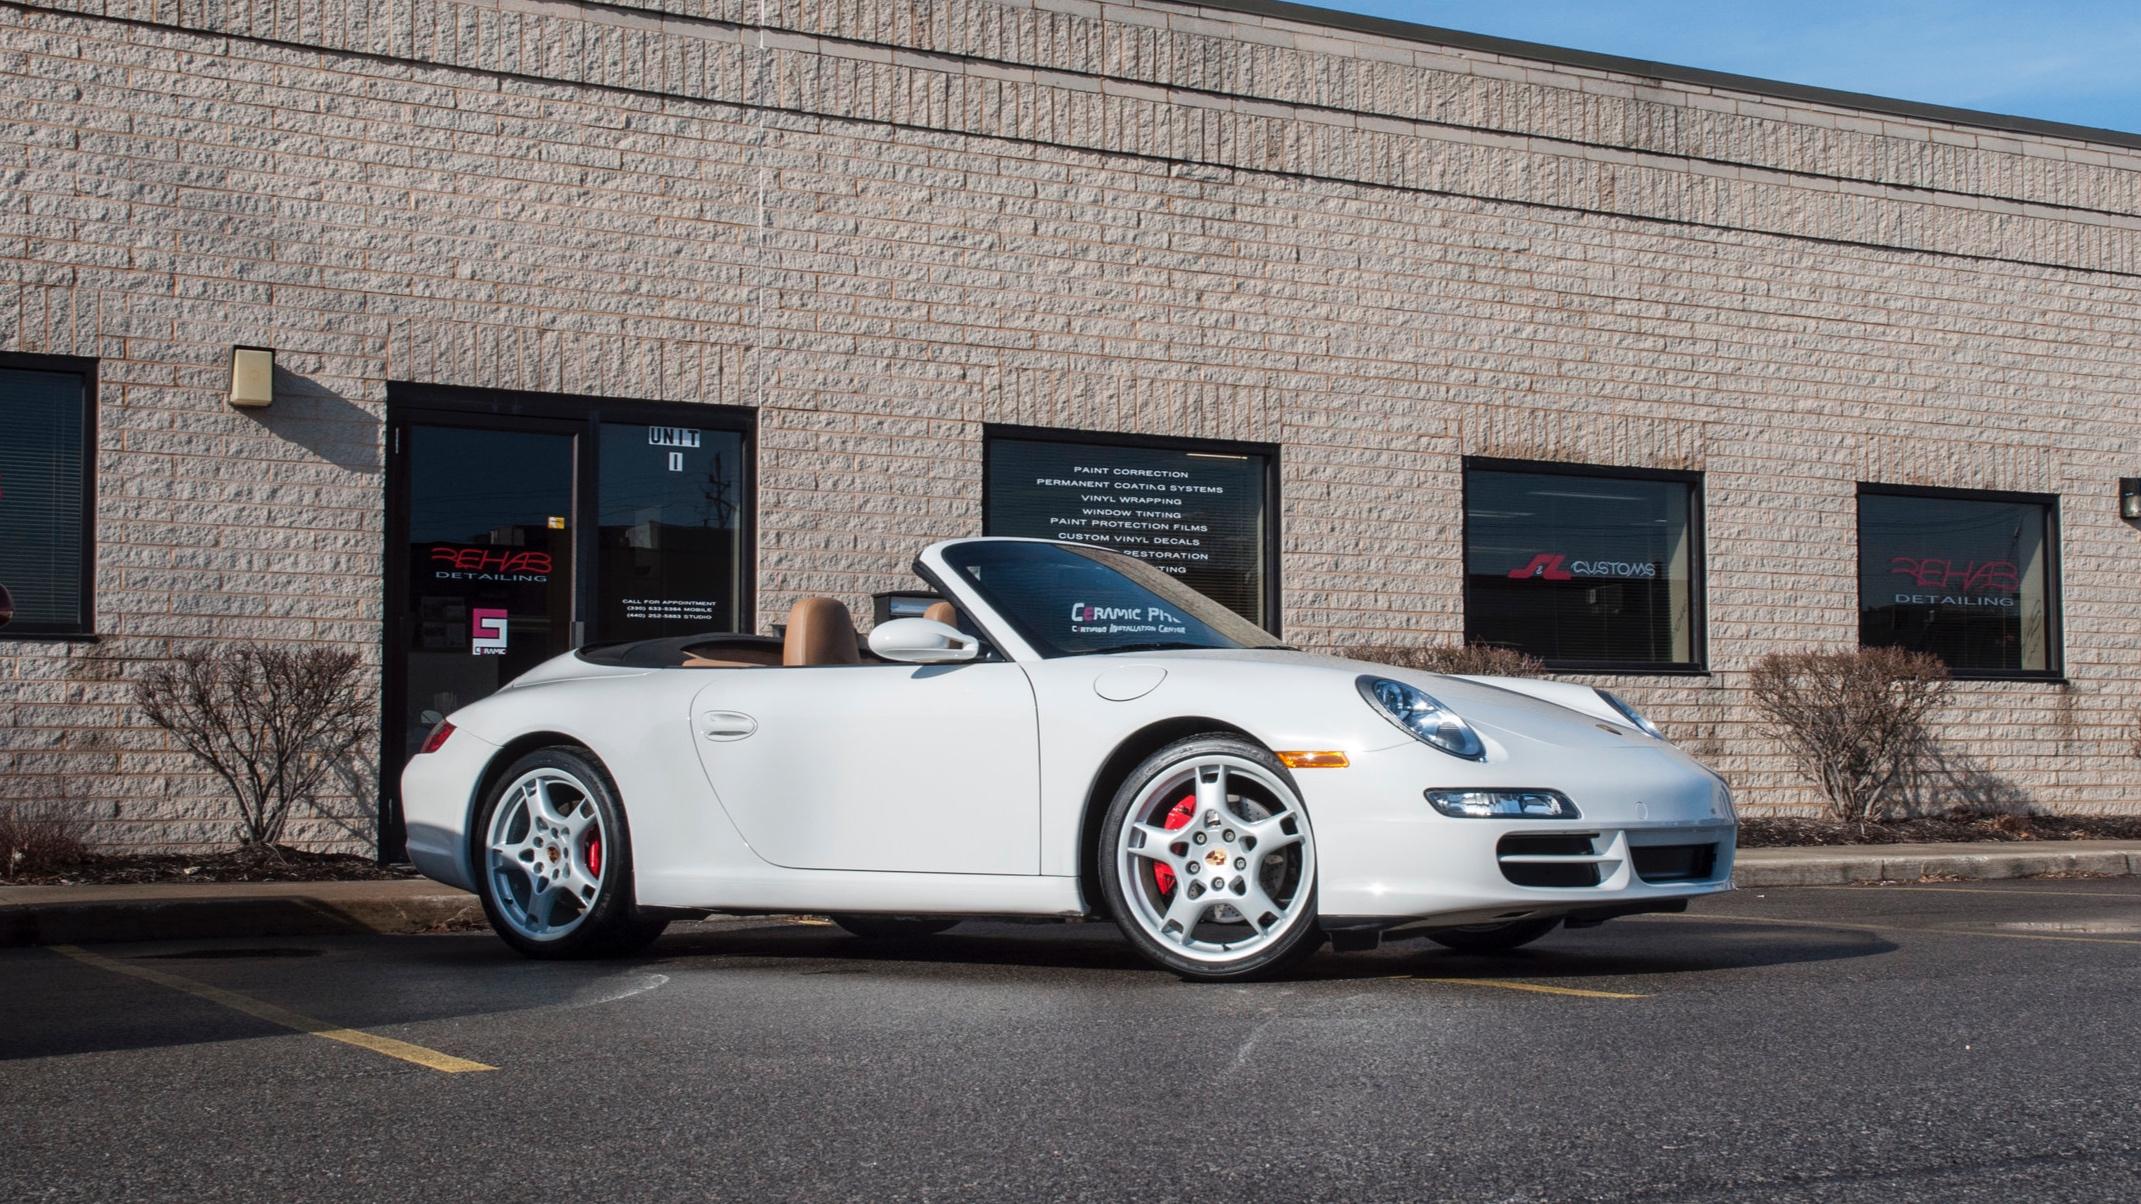 Porsche 911 Carrera S Cabriolet - Interior and Exterior Restoration, Rockstar Detail, Wheels Off